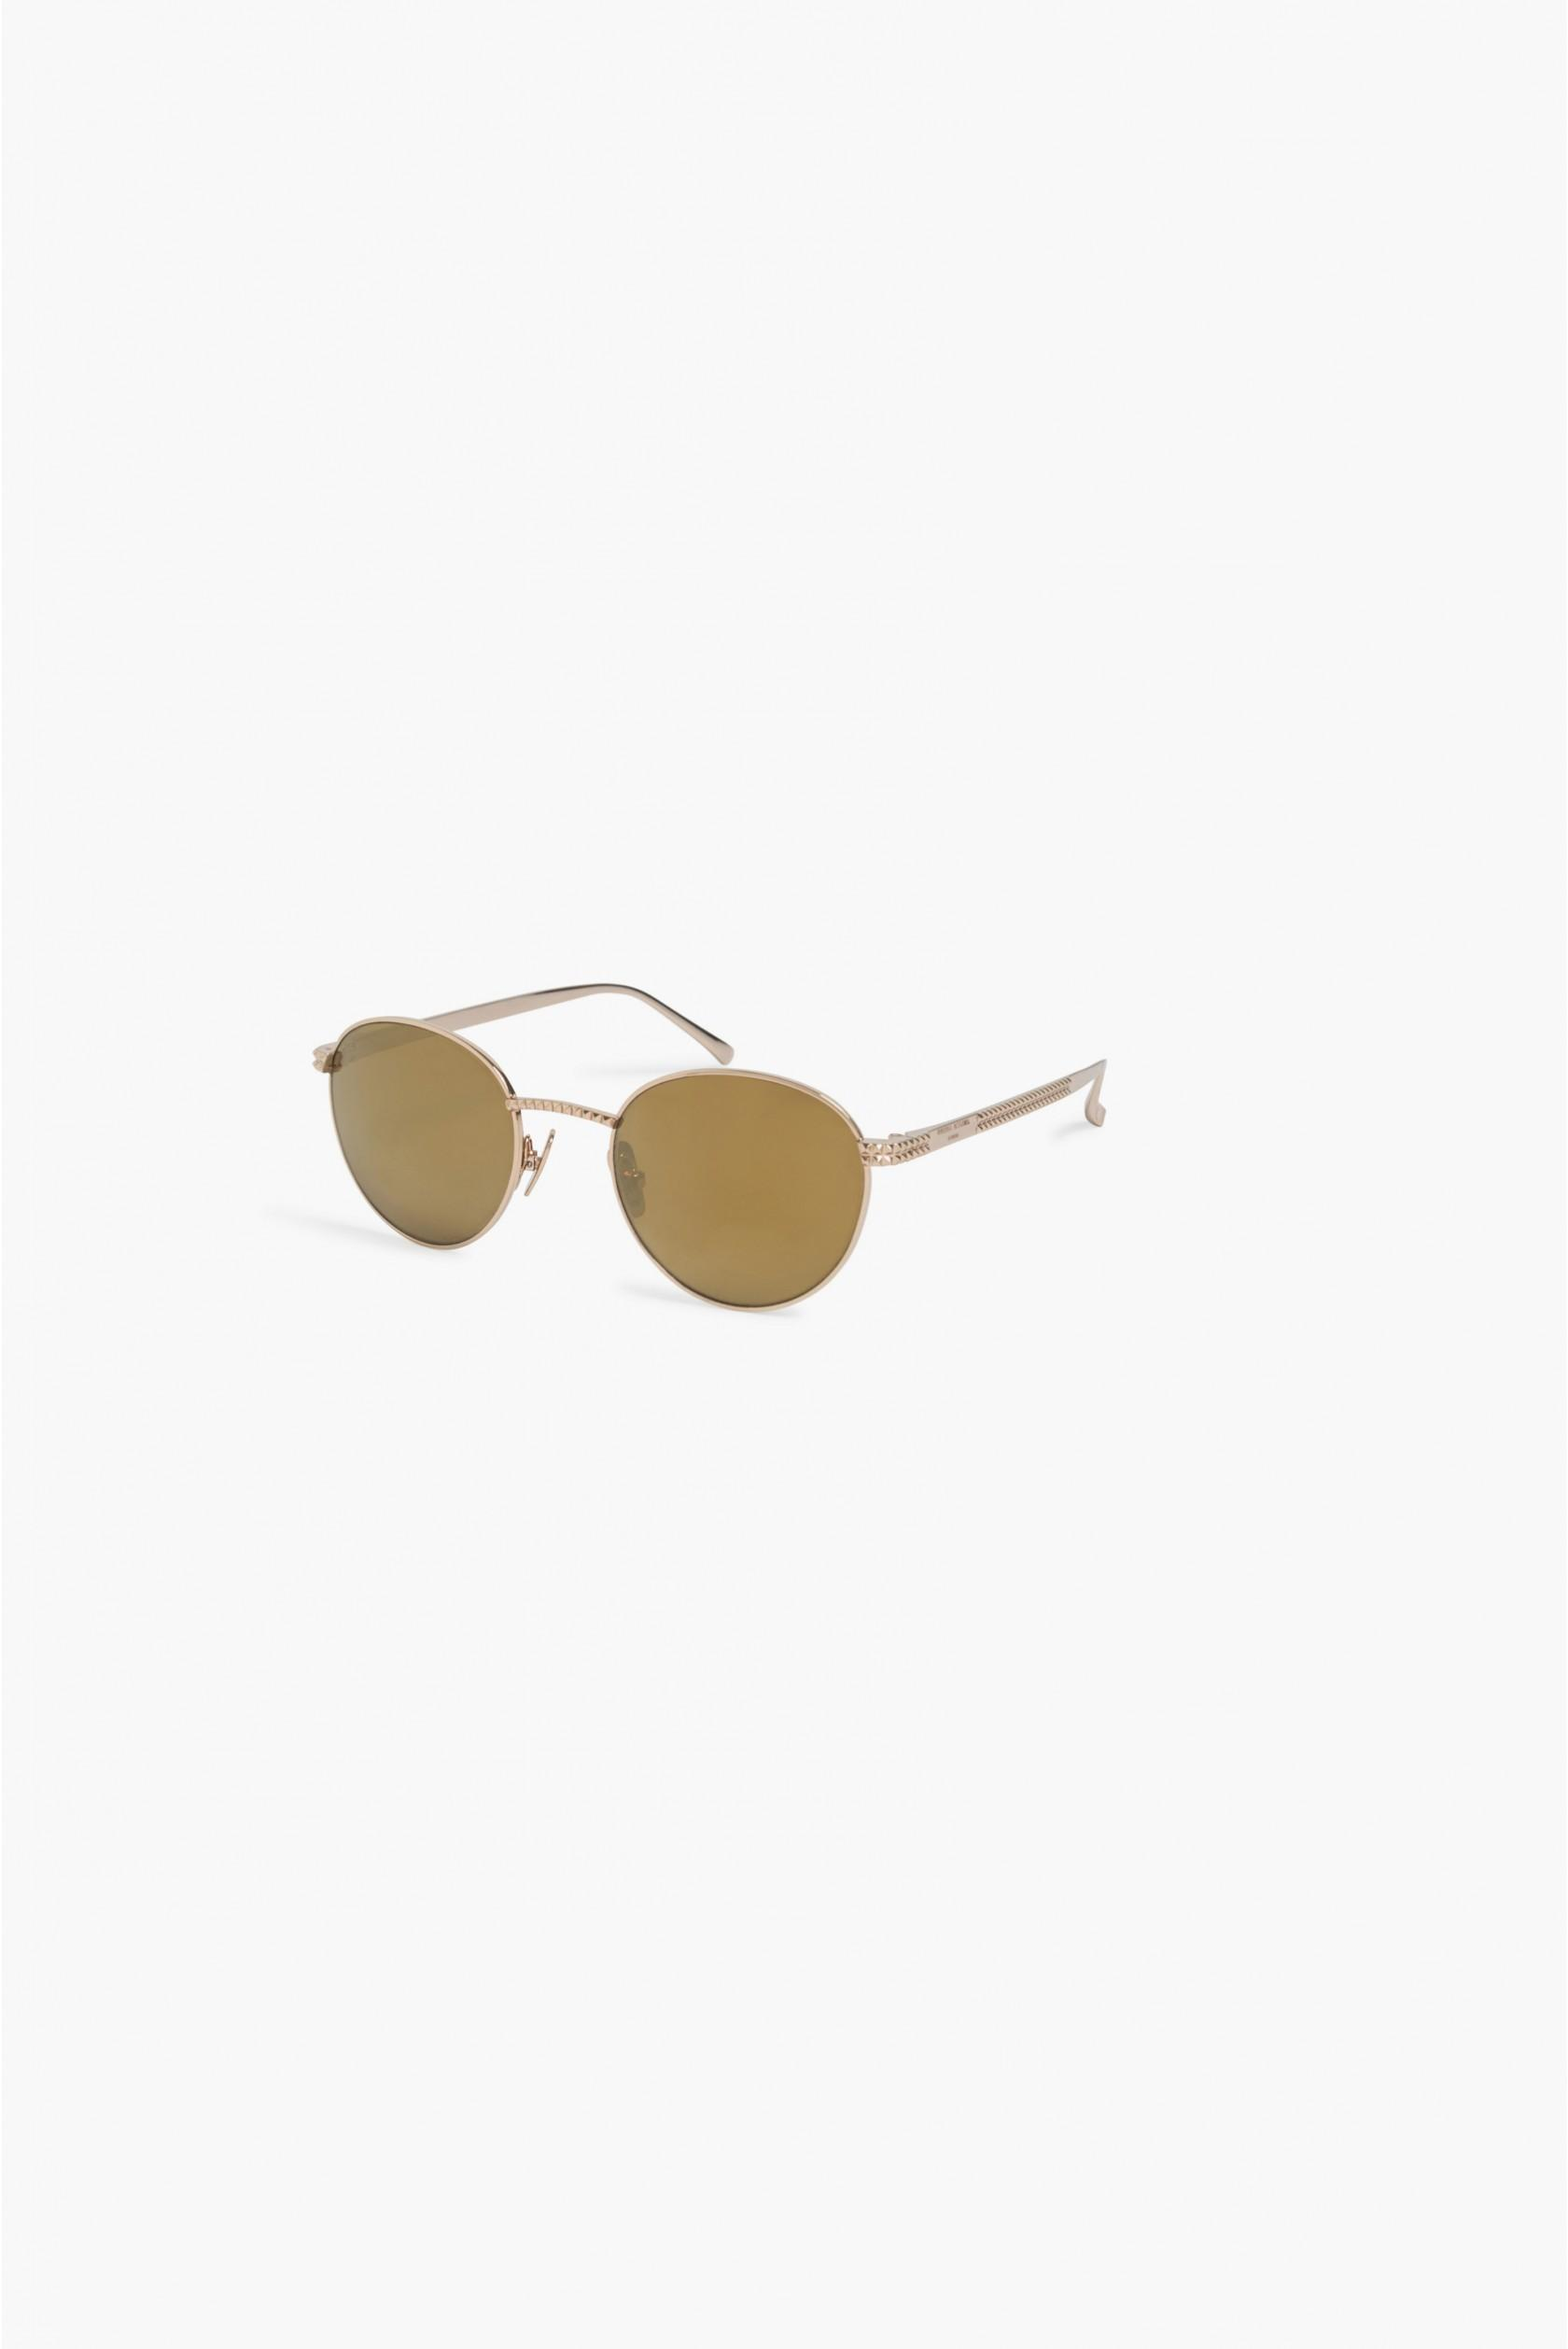 d37c22ac84f16 Sonia Rykiel. Women s Round Sunglasses